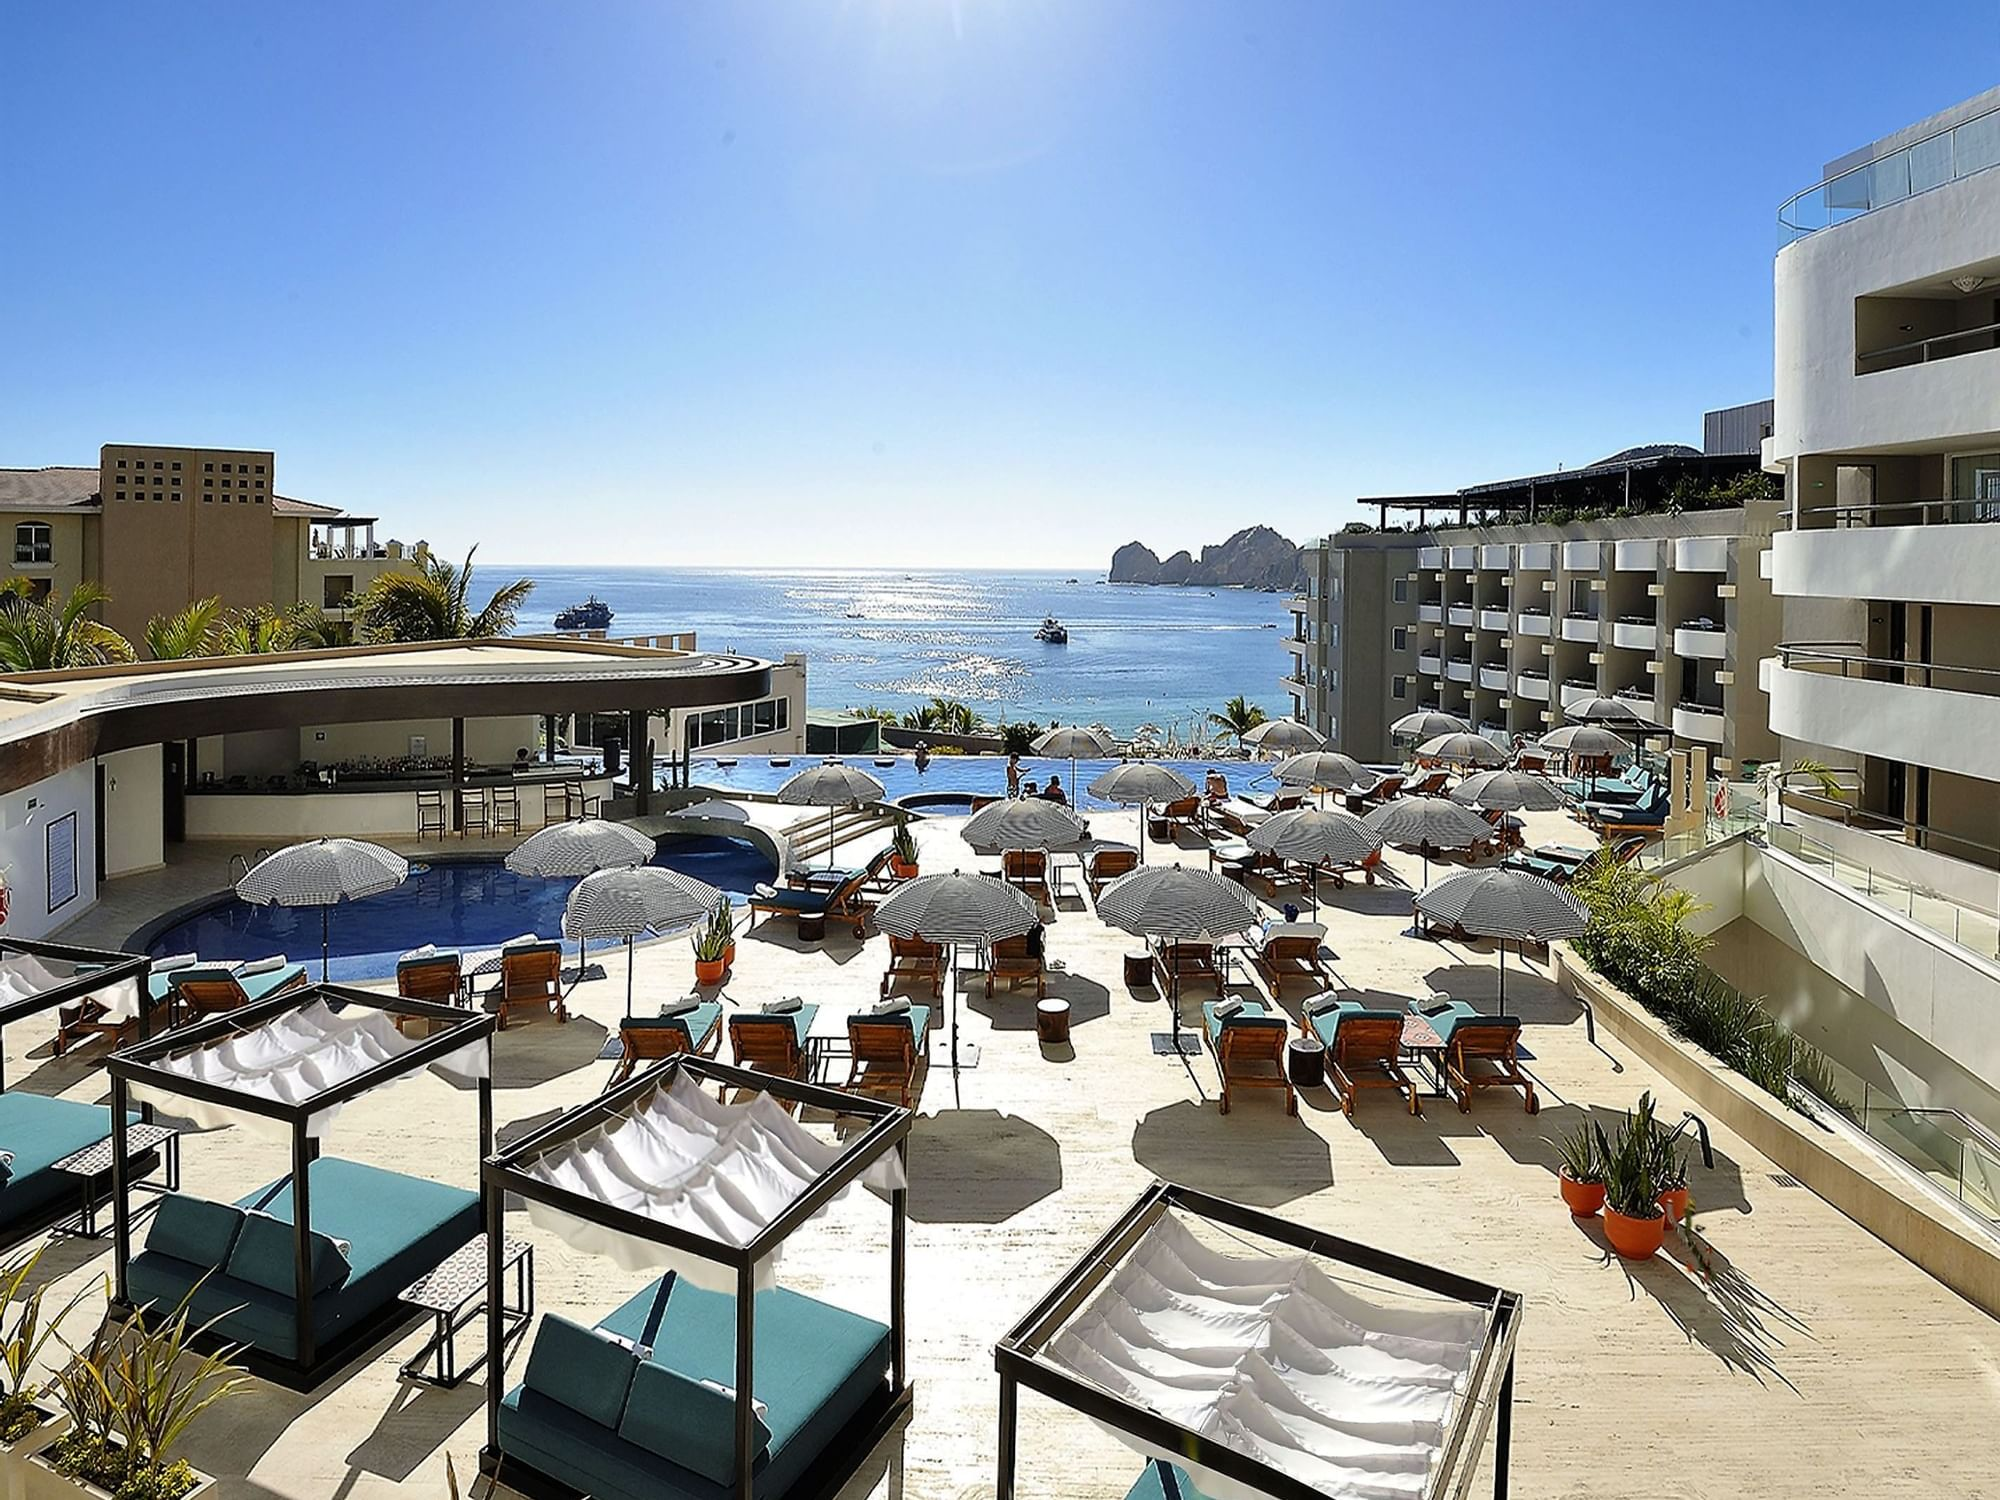 Corazón Pool Grill seating area at Cabo Villas Beach Resort